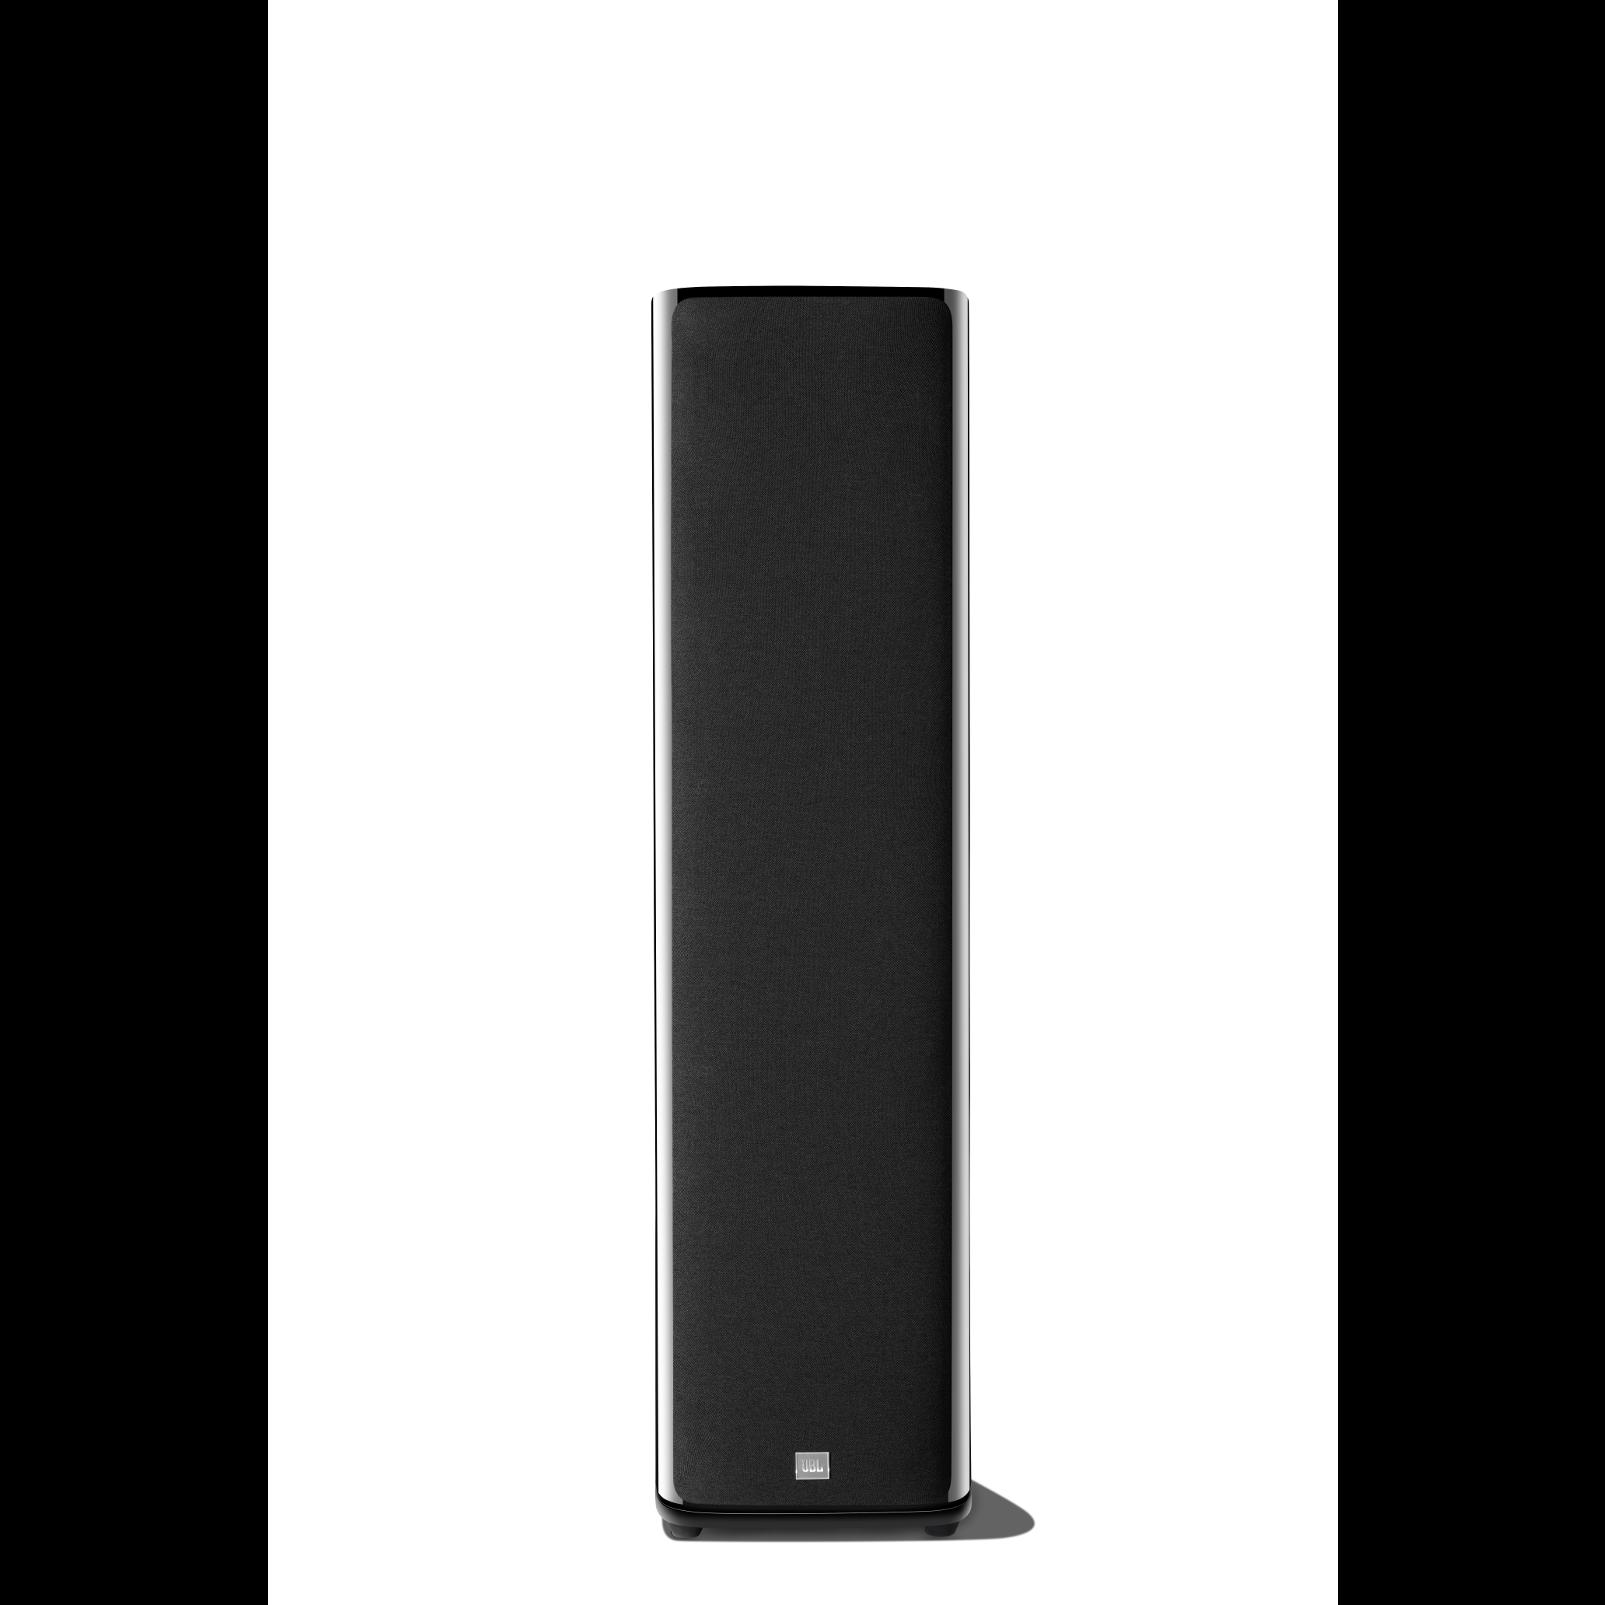 HDI-3800 - Black Gloss - 2 ½-way Triple 8-inch (200mm) Floorstanding Loudspeaker - Front